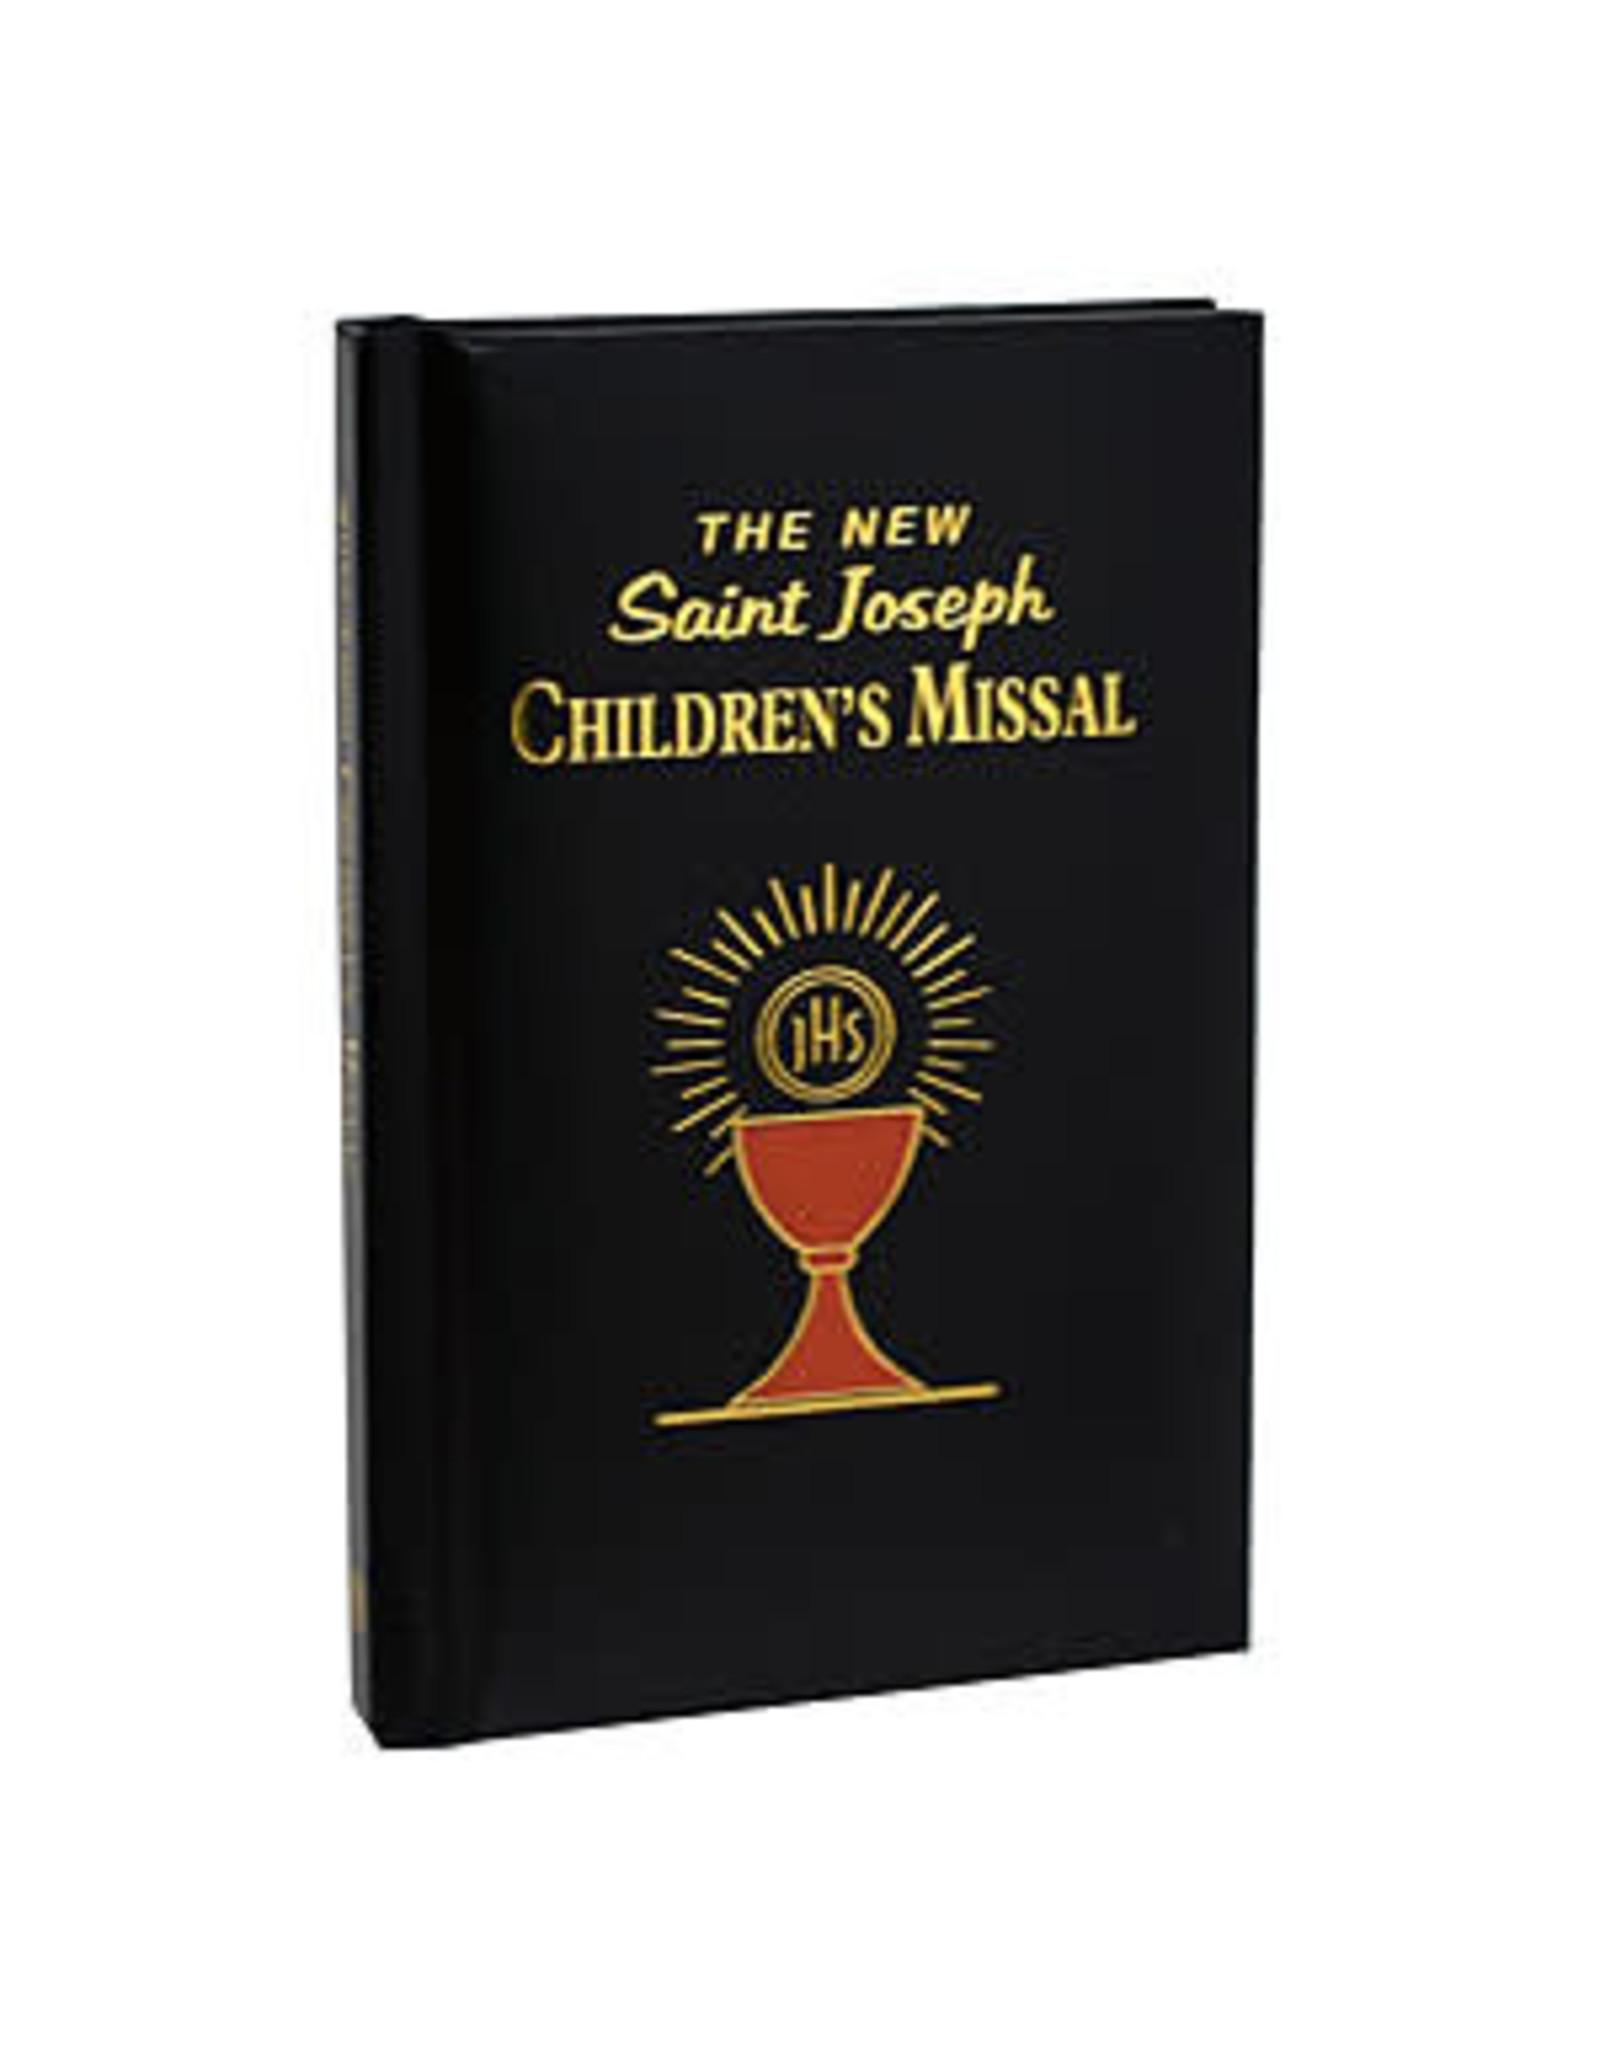 New Saint Joseph's Children's Missal black